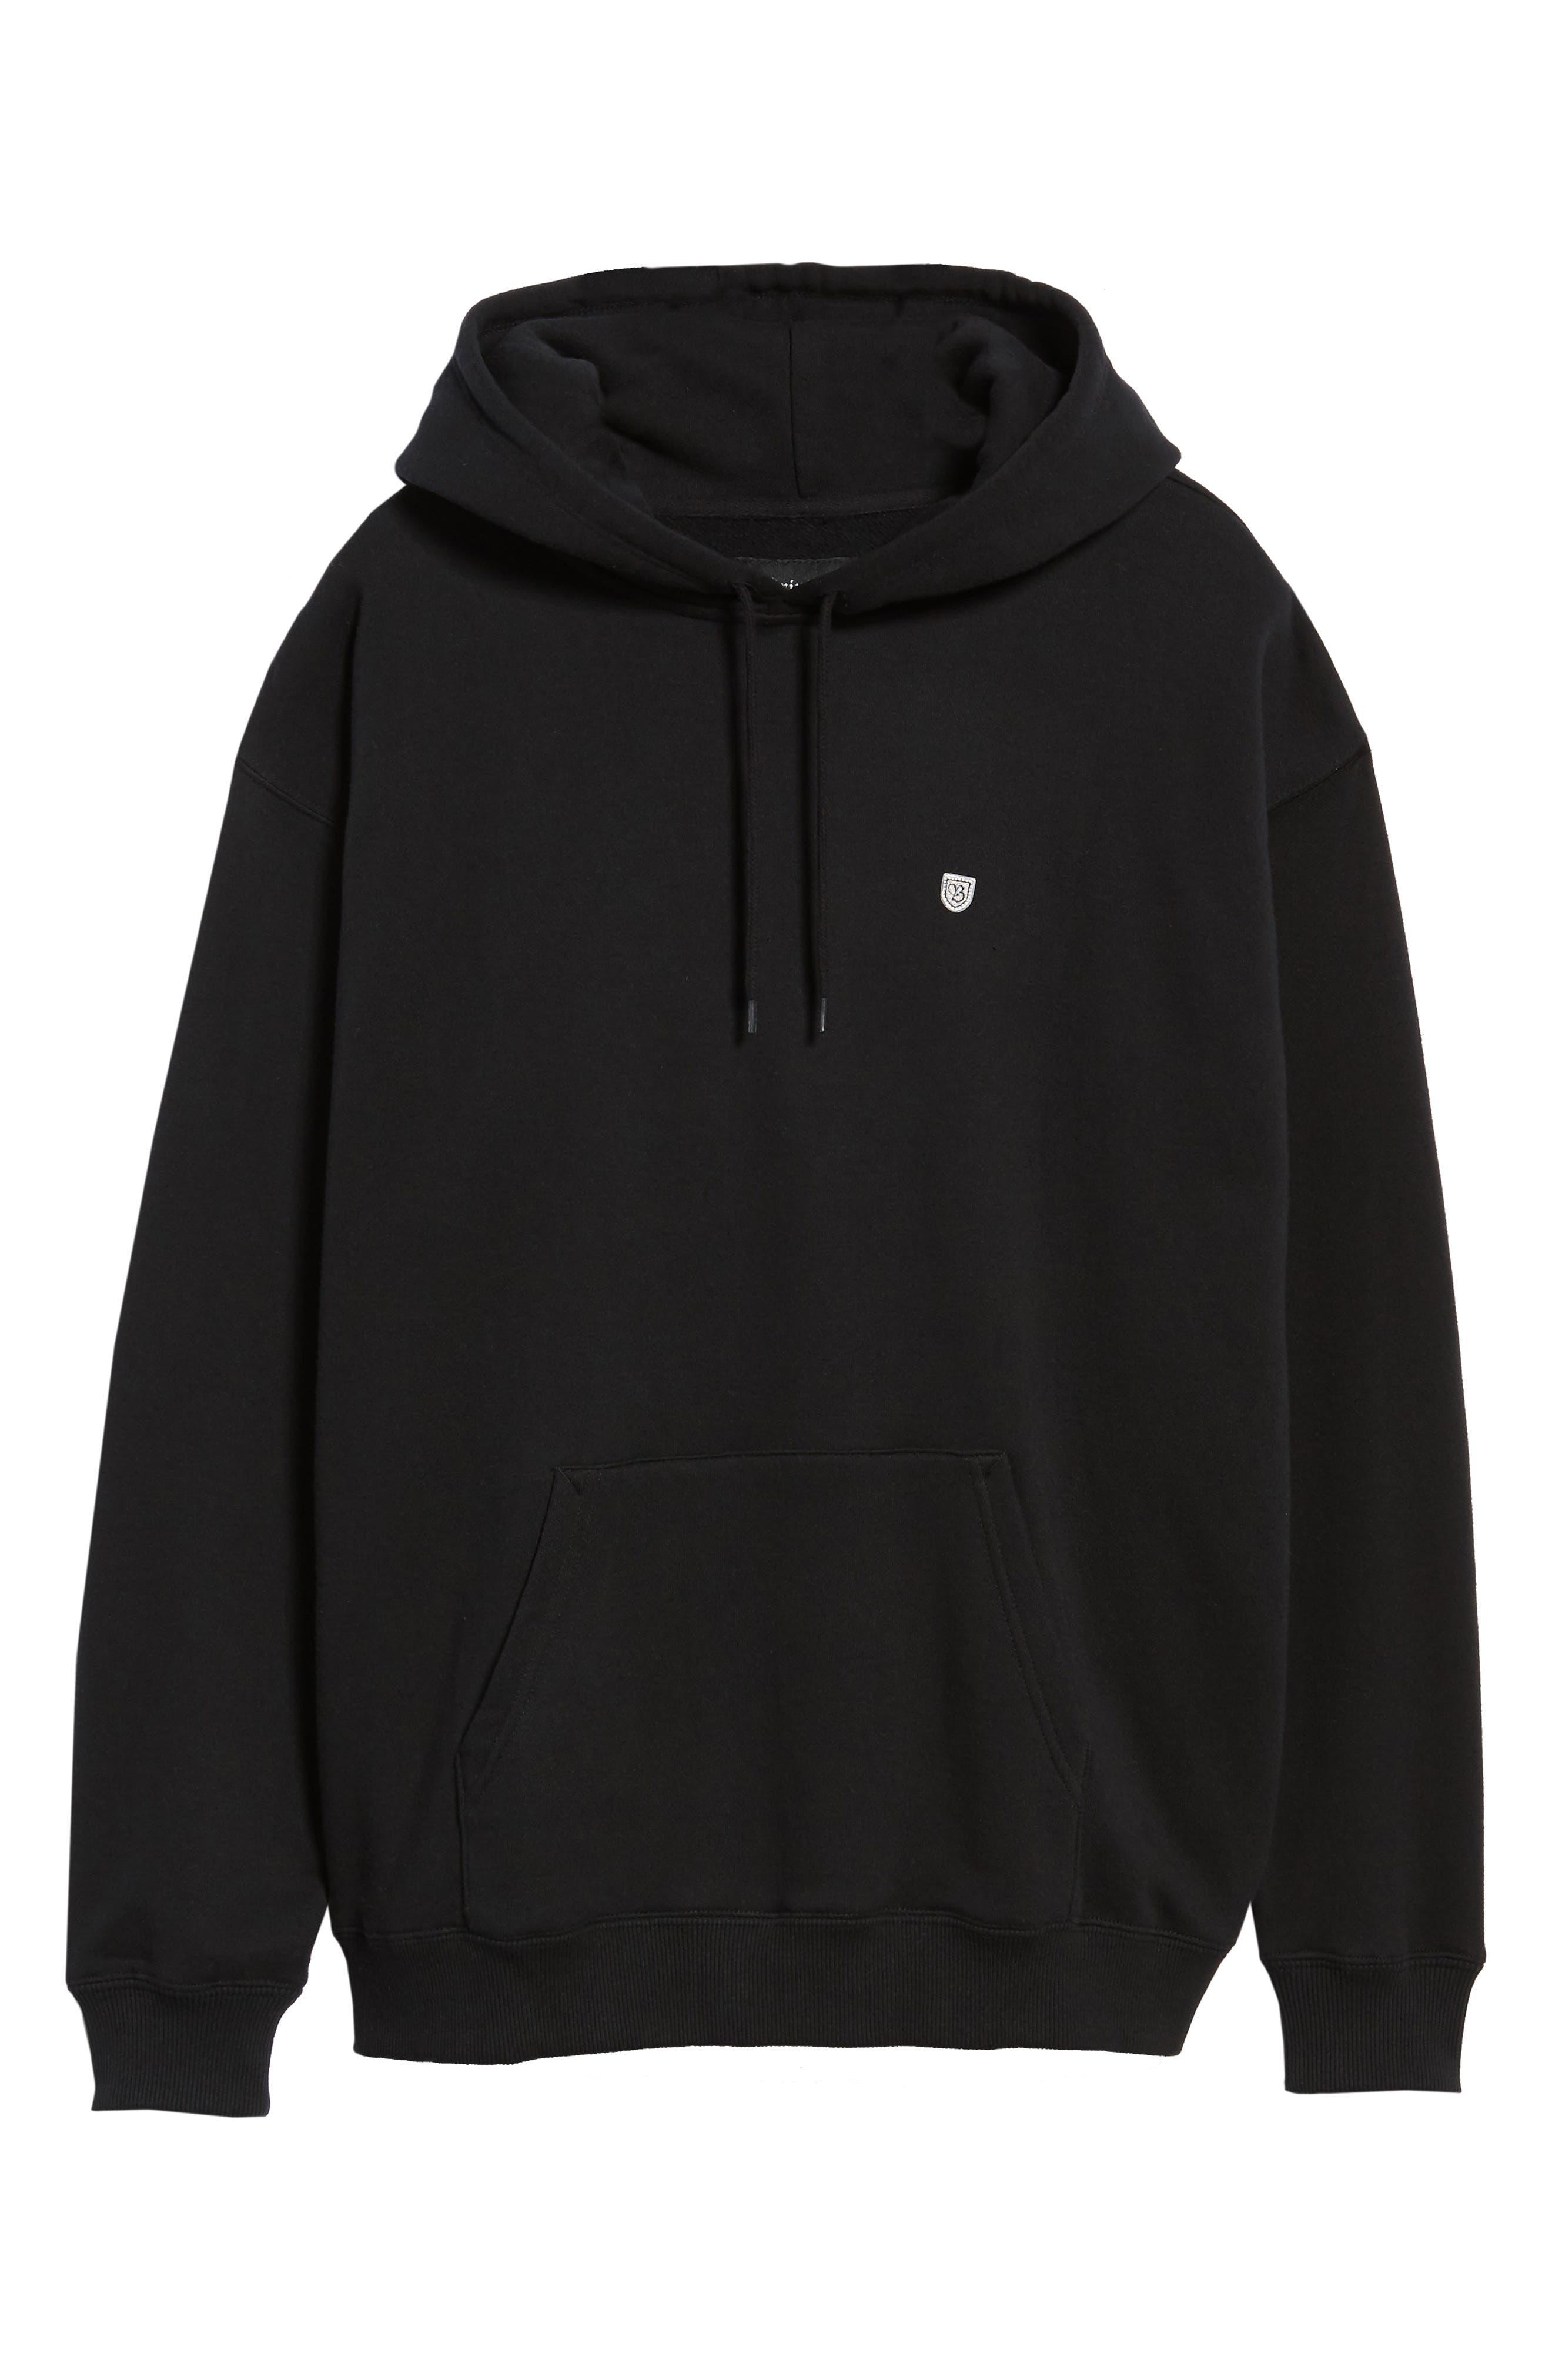 B-Shield Hooded Sweatshirt,                             Alternate thumbnail 6, color,                             001